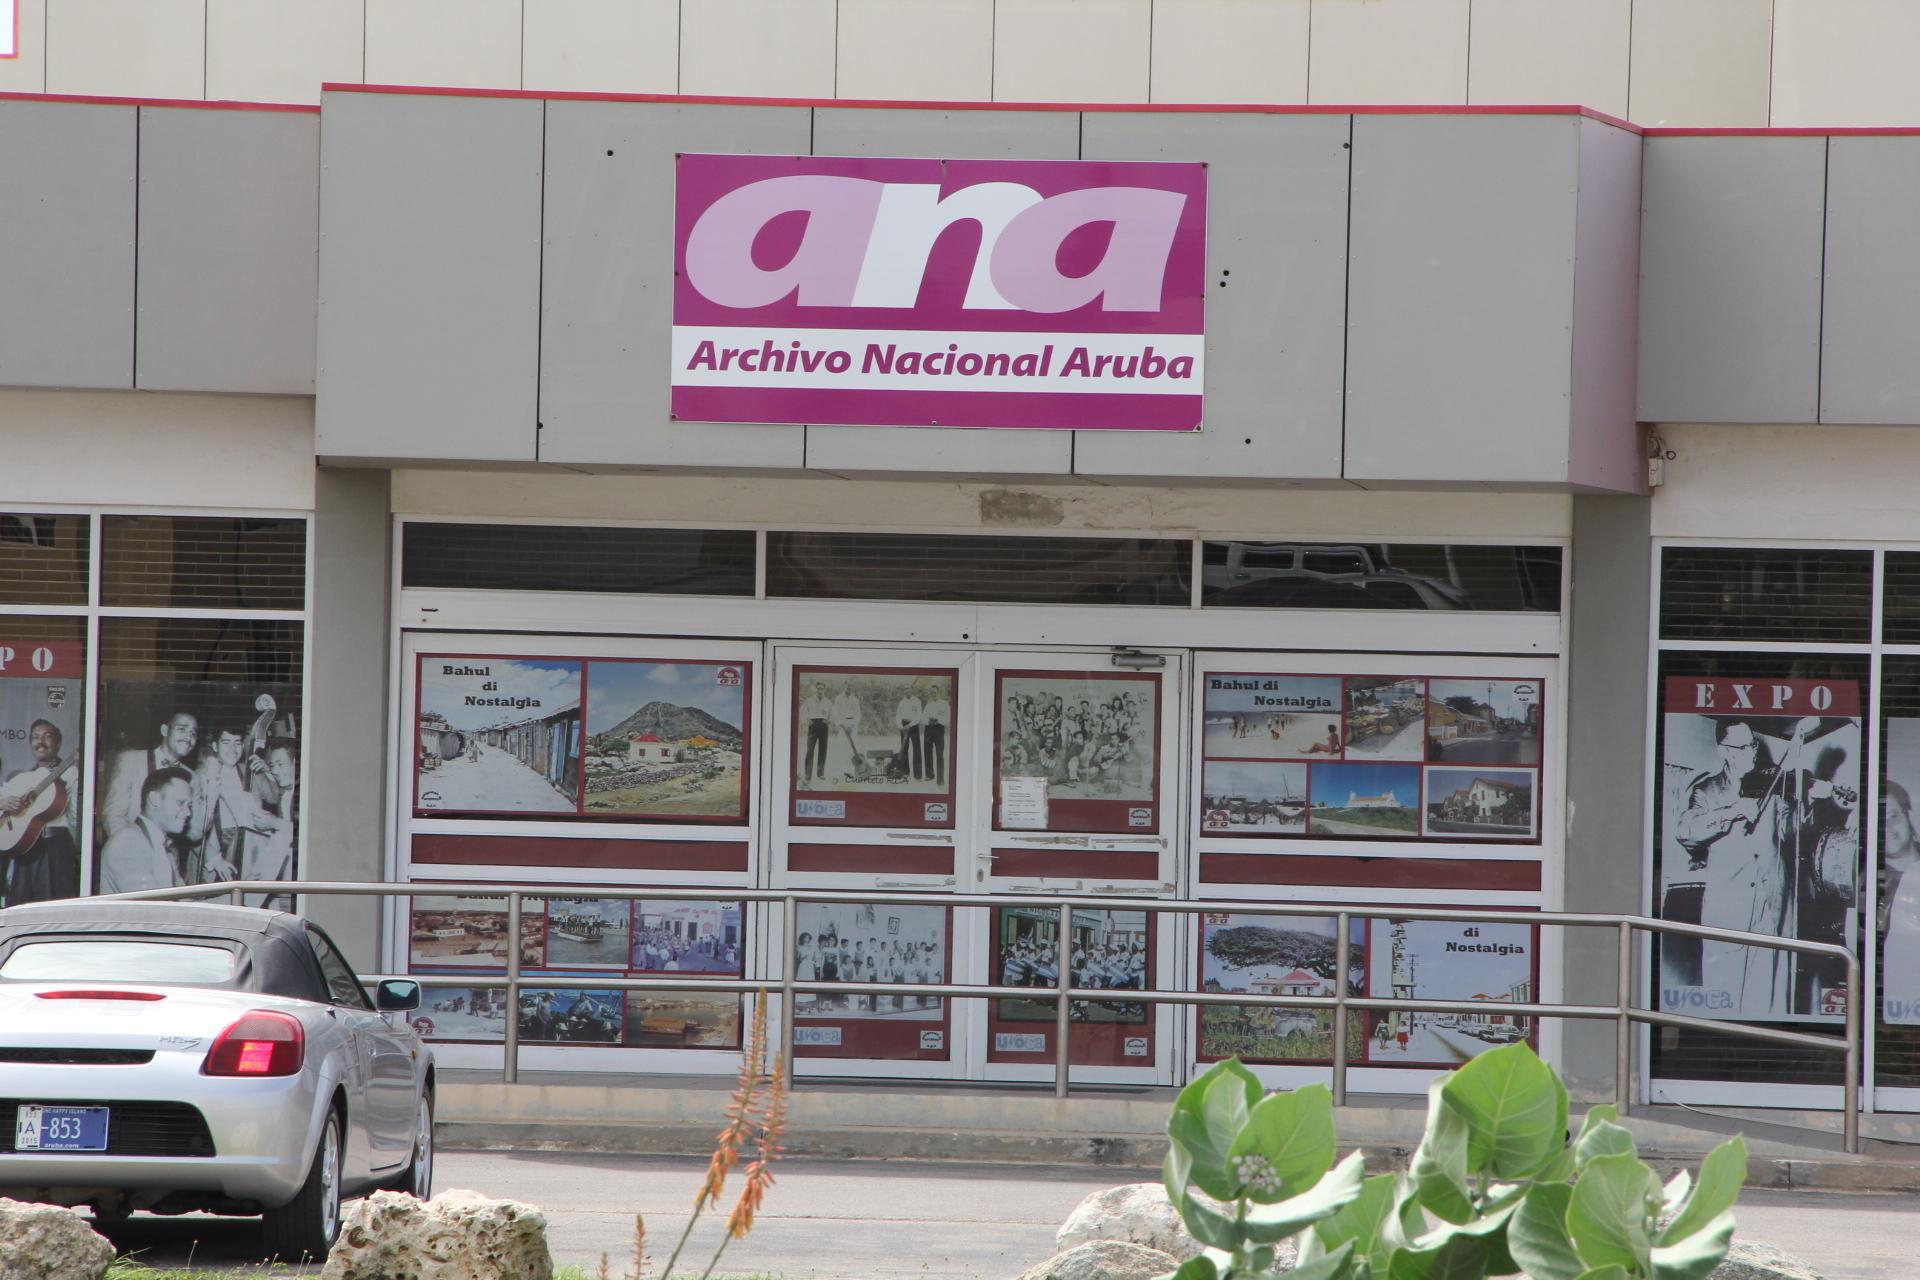 Edificio Archivo Nacional Aruba